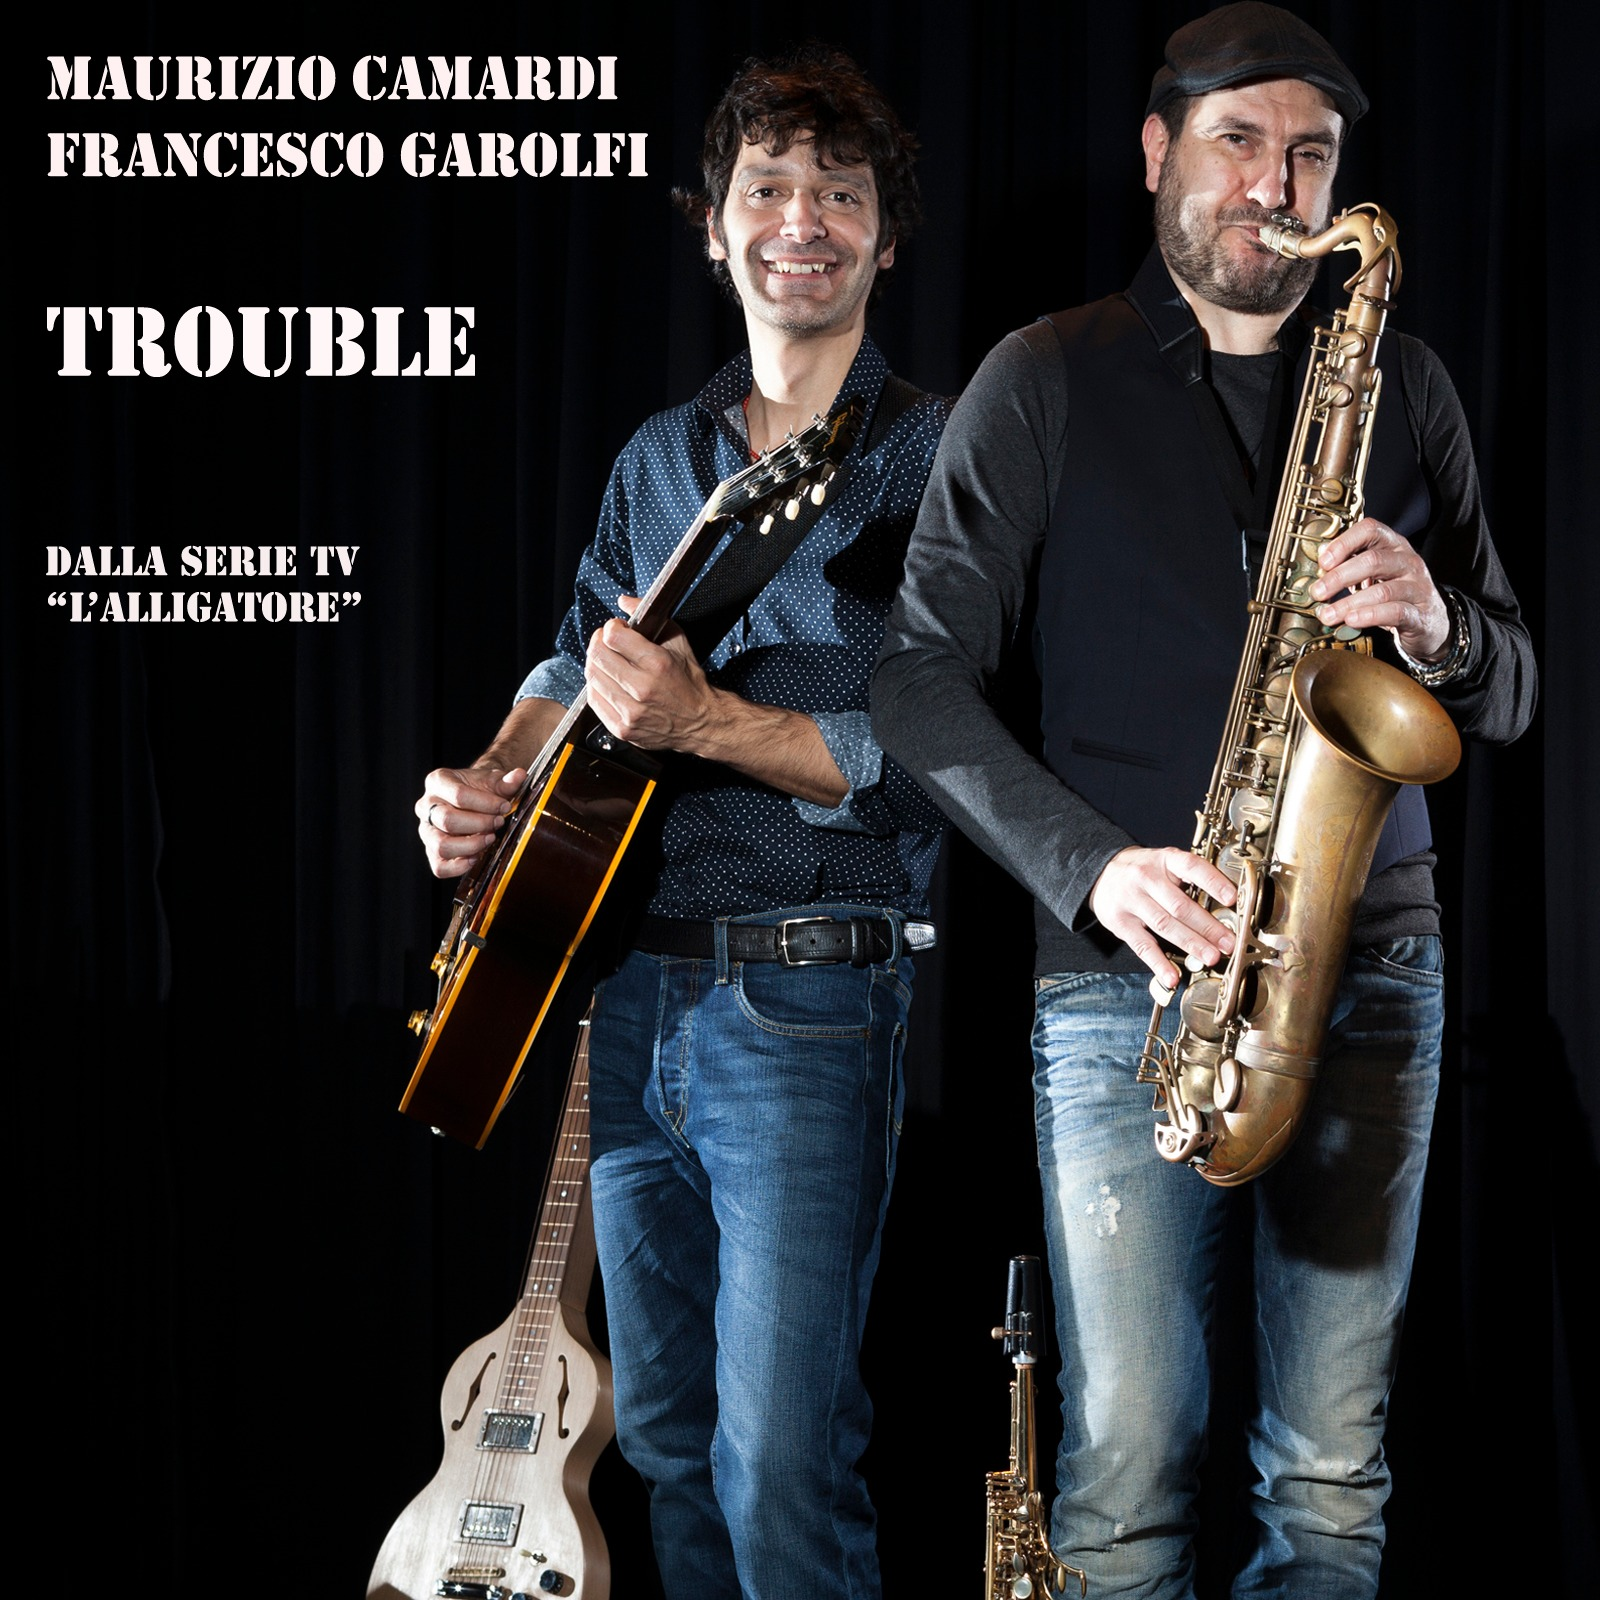 Trouble - Camardi Garolfi - L'Alligatore RAI2 Carlotto